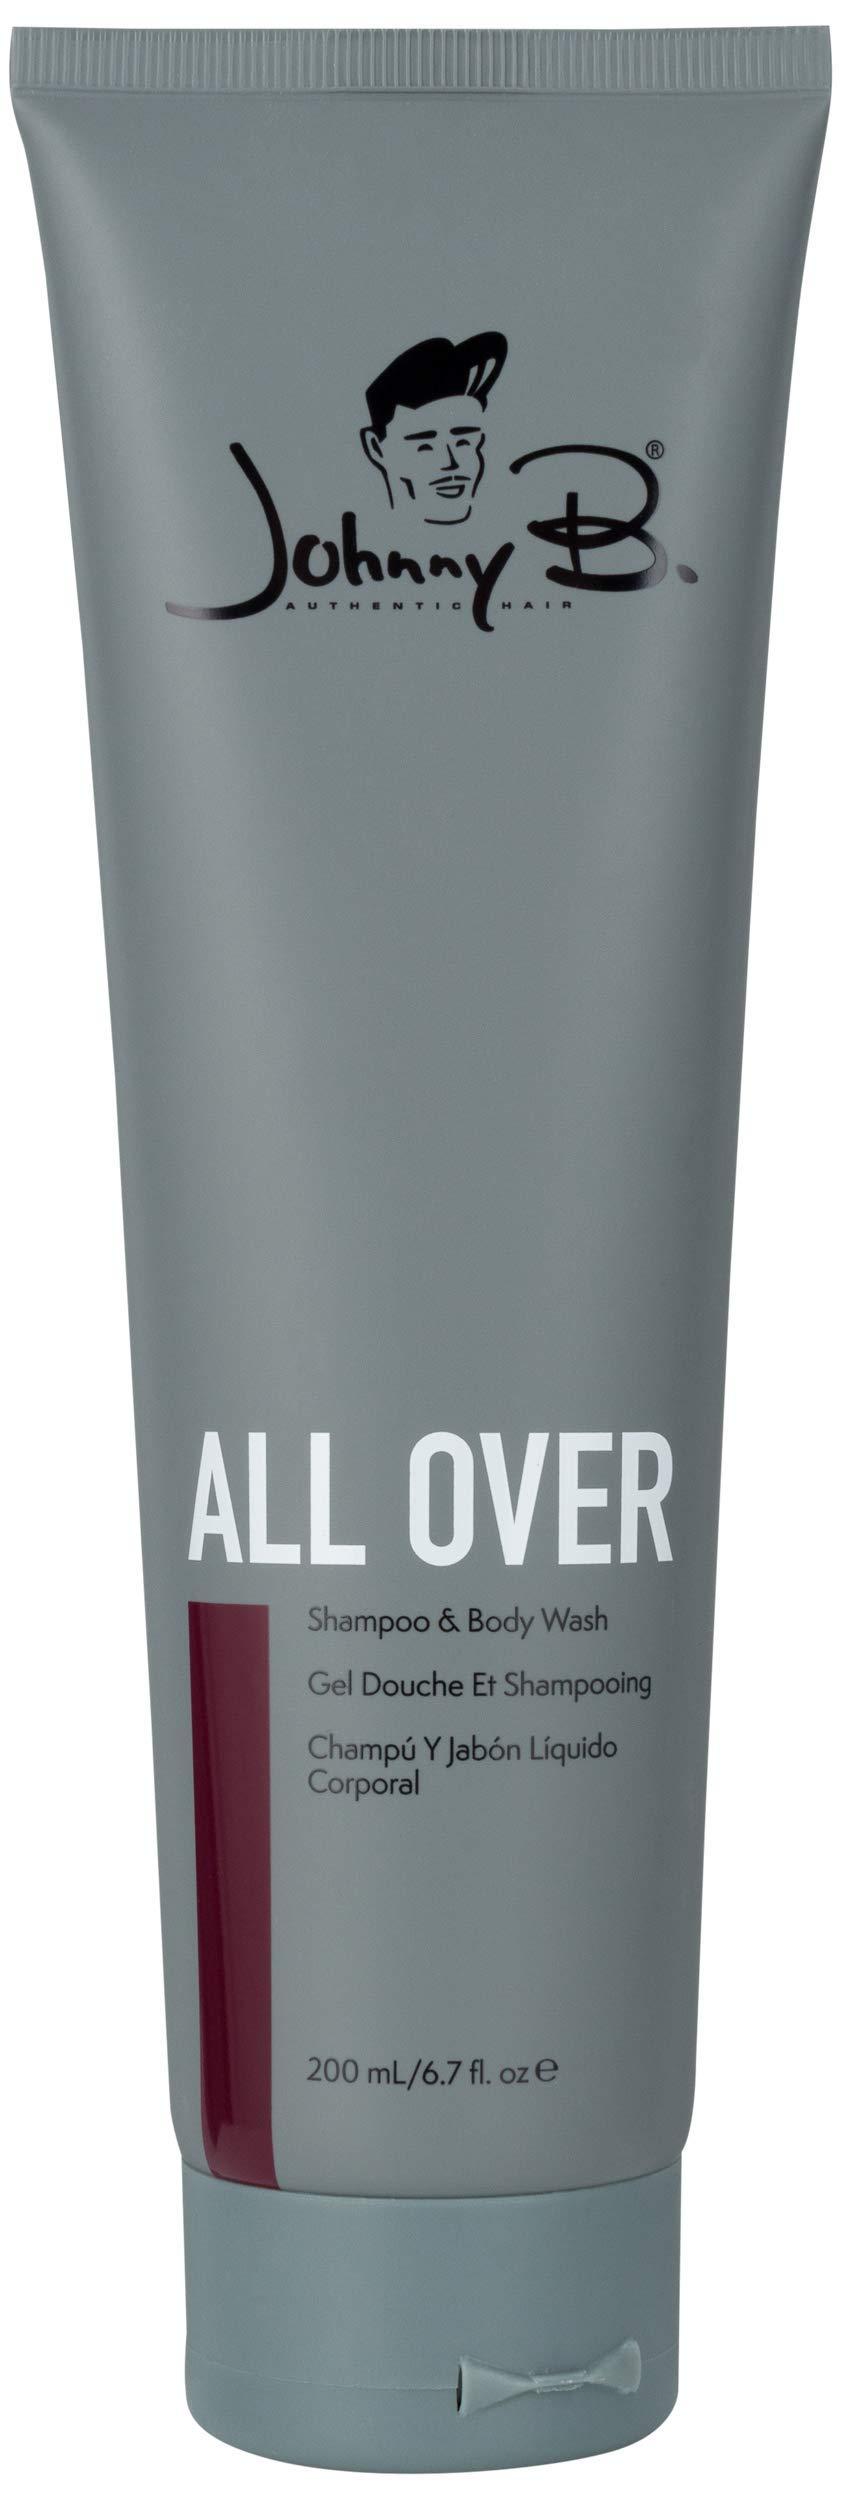 JOHNNY B. All Over Energizing Shampoo & Body Wash (6.7 ...